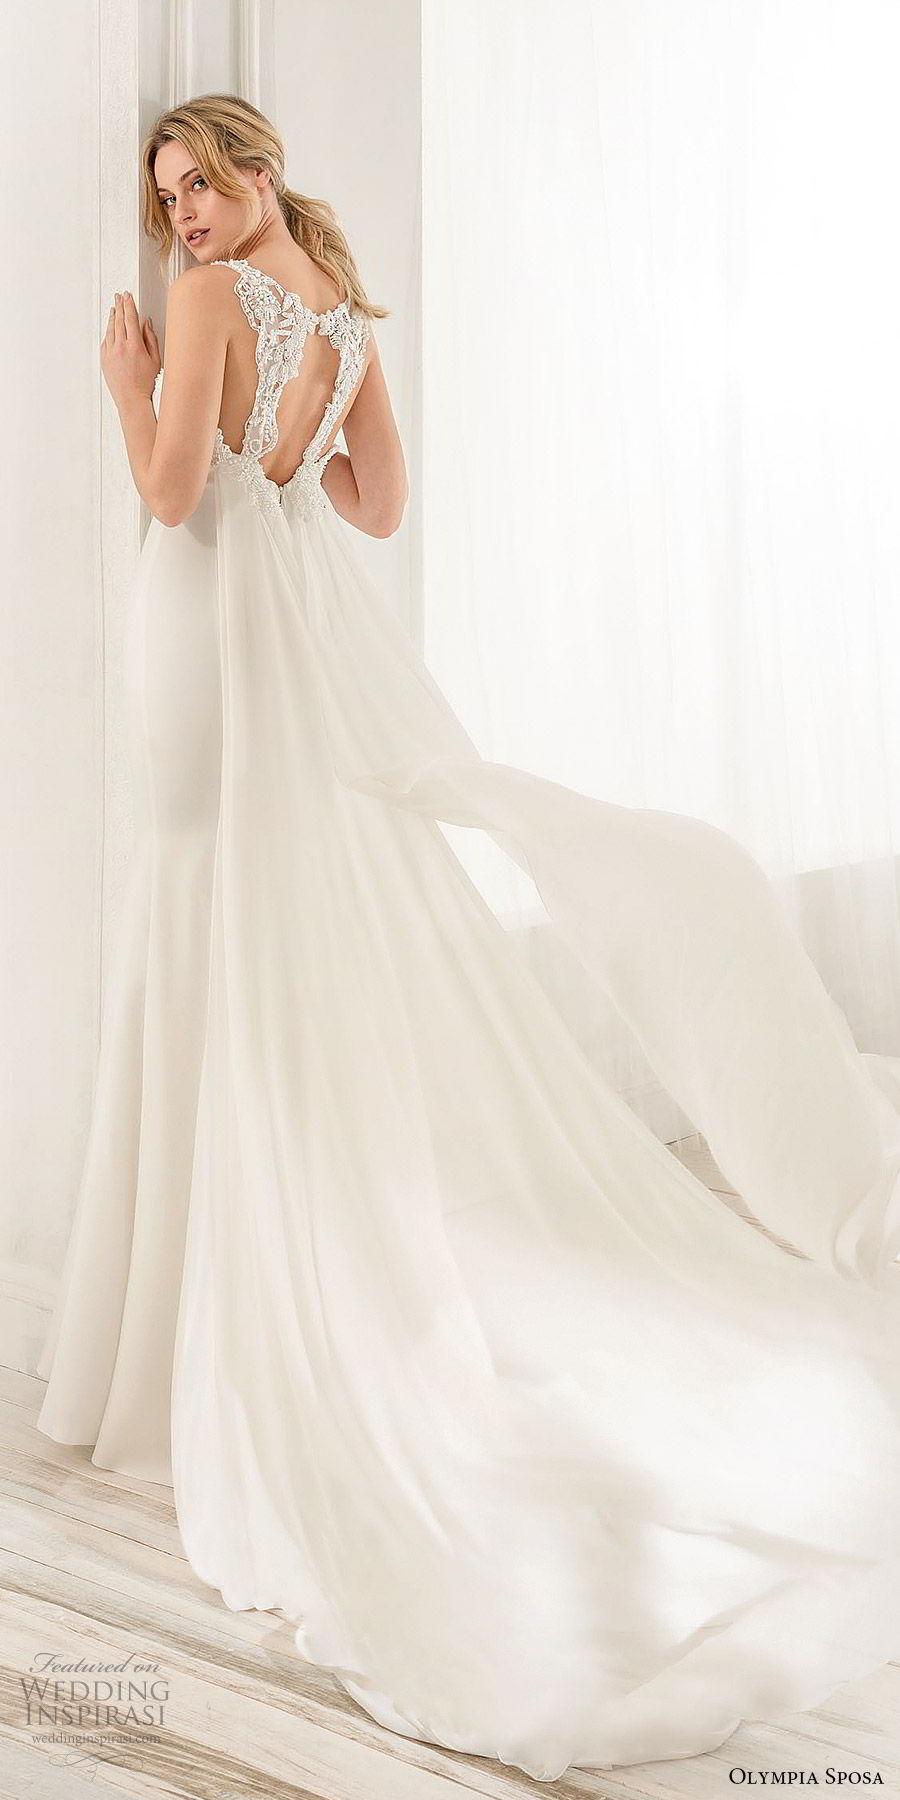 olympia sposa 2020 bridal sleeveless thick lace straps embellisshed deep v neckline keyhole mermaid wedding dress (3) elegant sleek clean back watteau chapel train bv